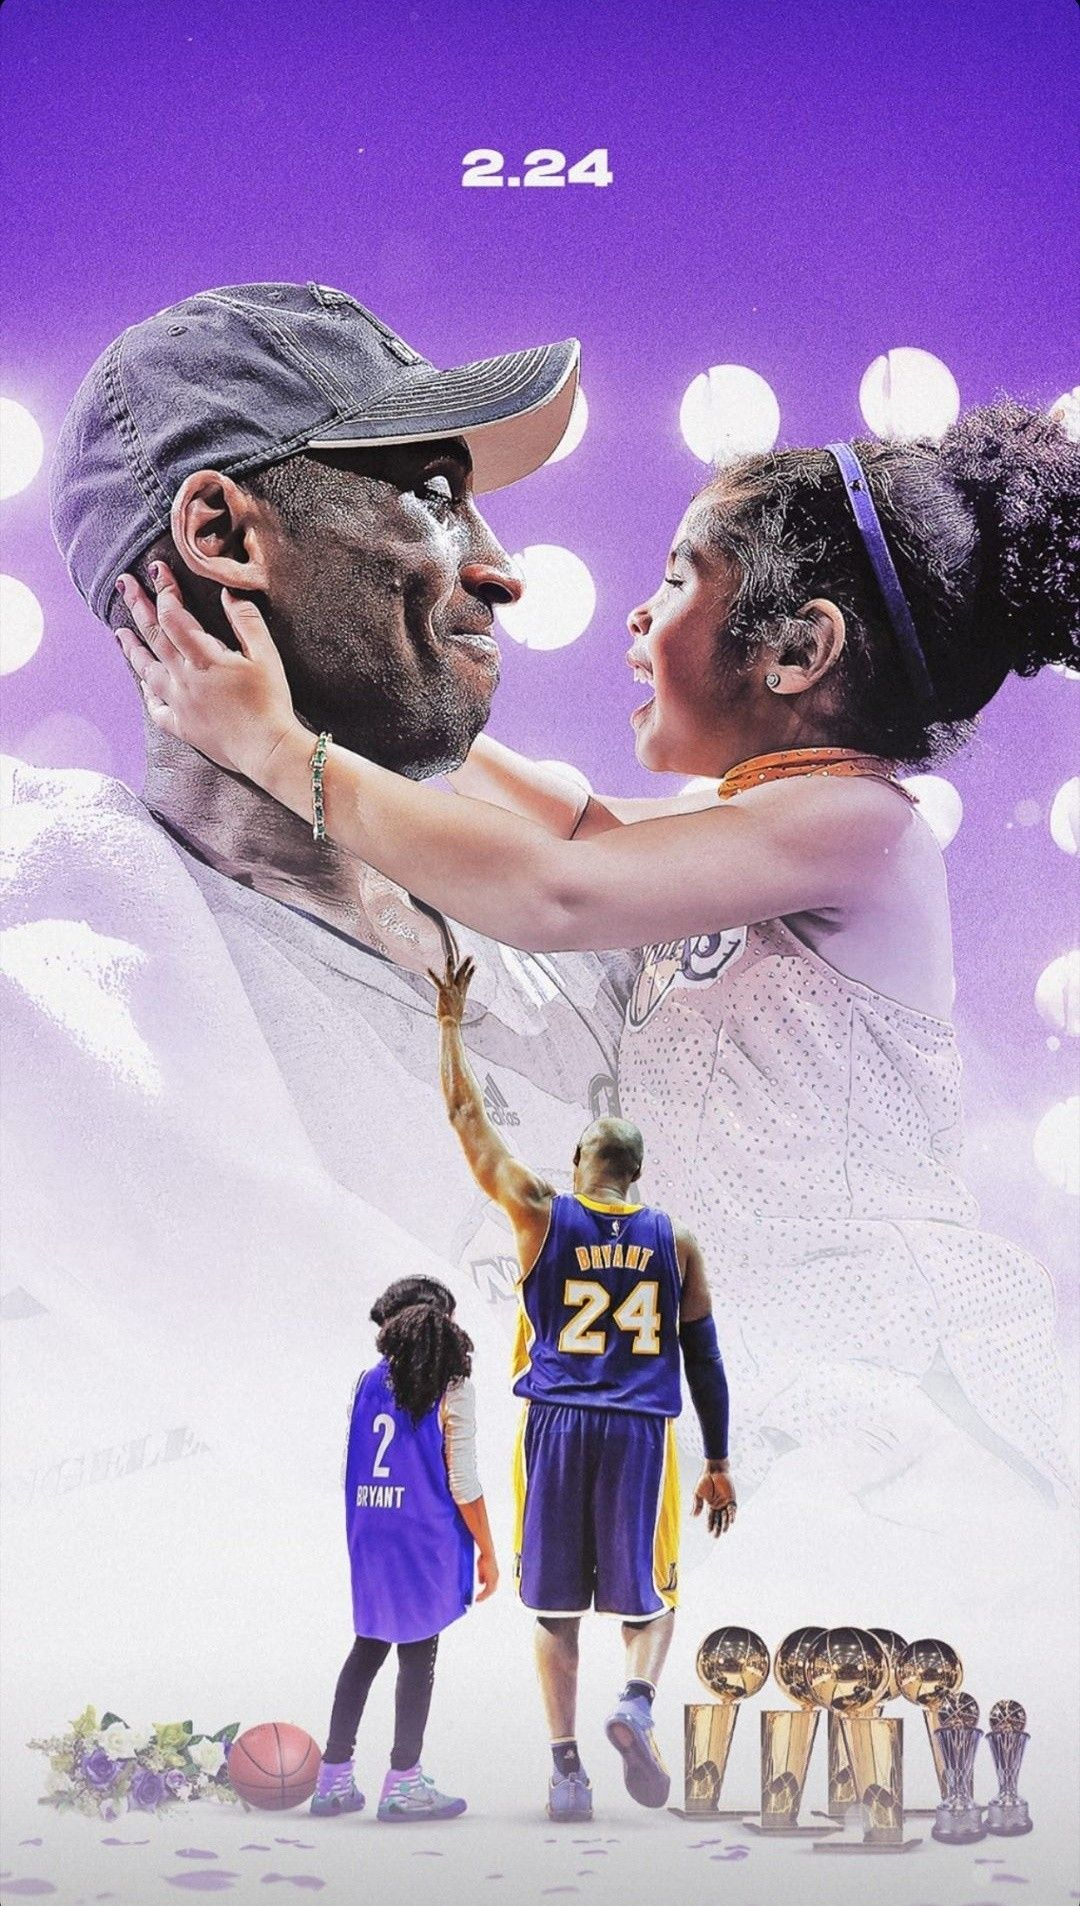 Kobe And Gigi Bryant Wallpaper In 2021 Kobe Bryant Pictures Kobe Bryant Wallpaper Kobe Bryant Poster Kobe and gigi wallpaper iphone 6s